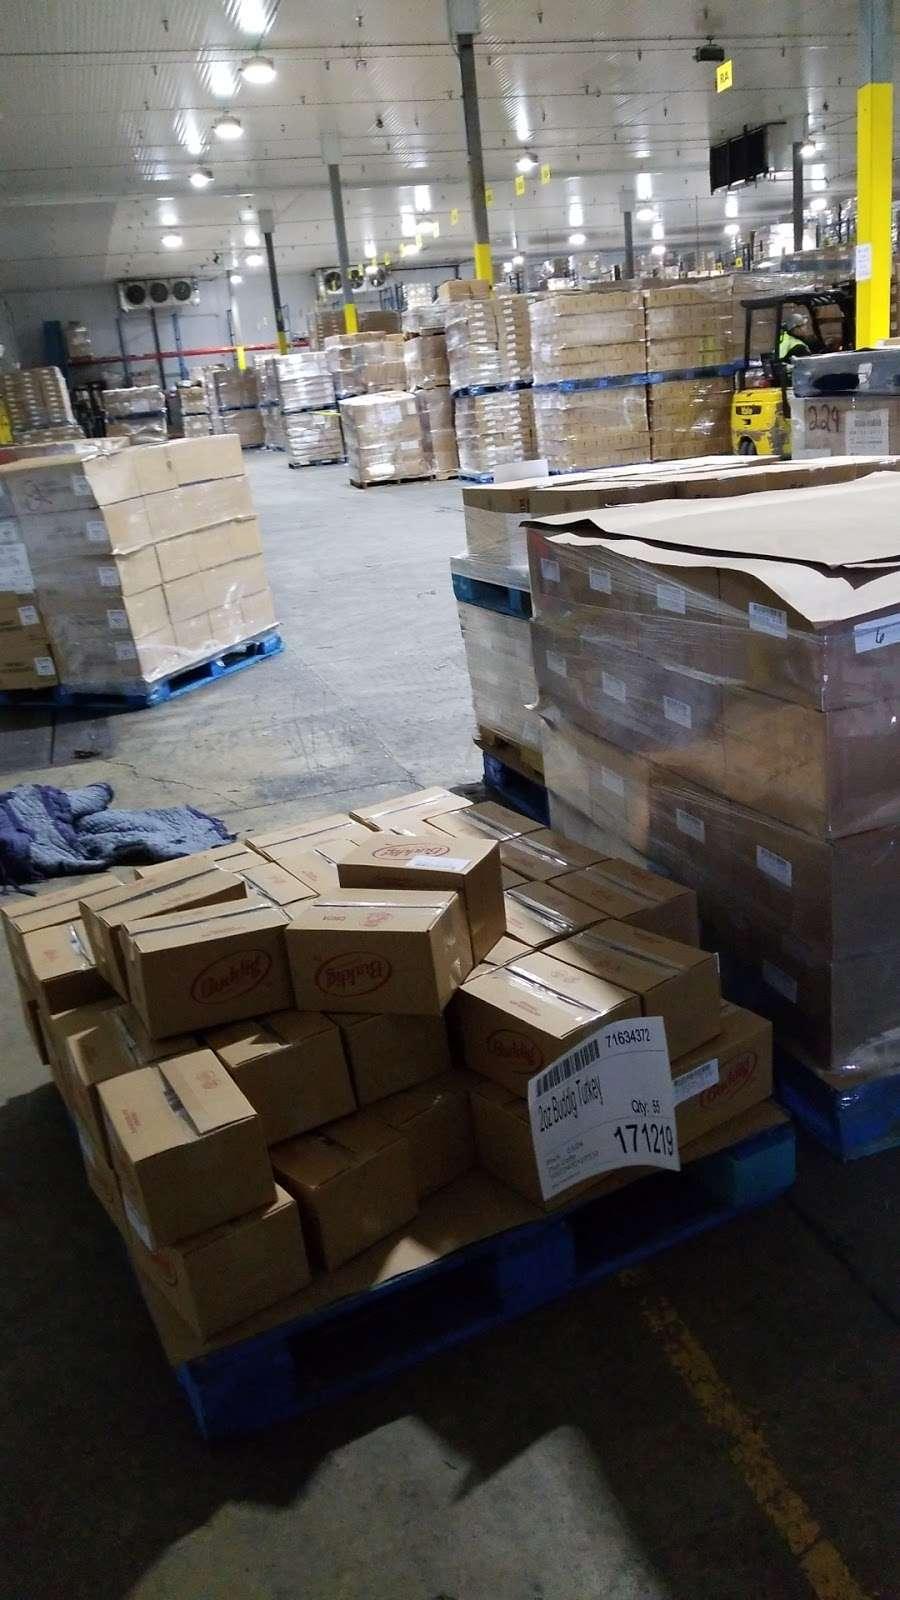 Carl Buddig Company - storage  | Photo 1 of 5 | Address: 215 45th St, Munster, IN 46321, USA | Phone: (708) 210-3130